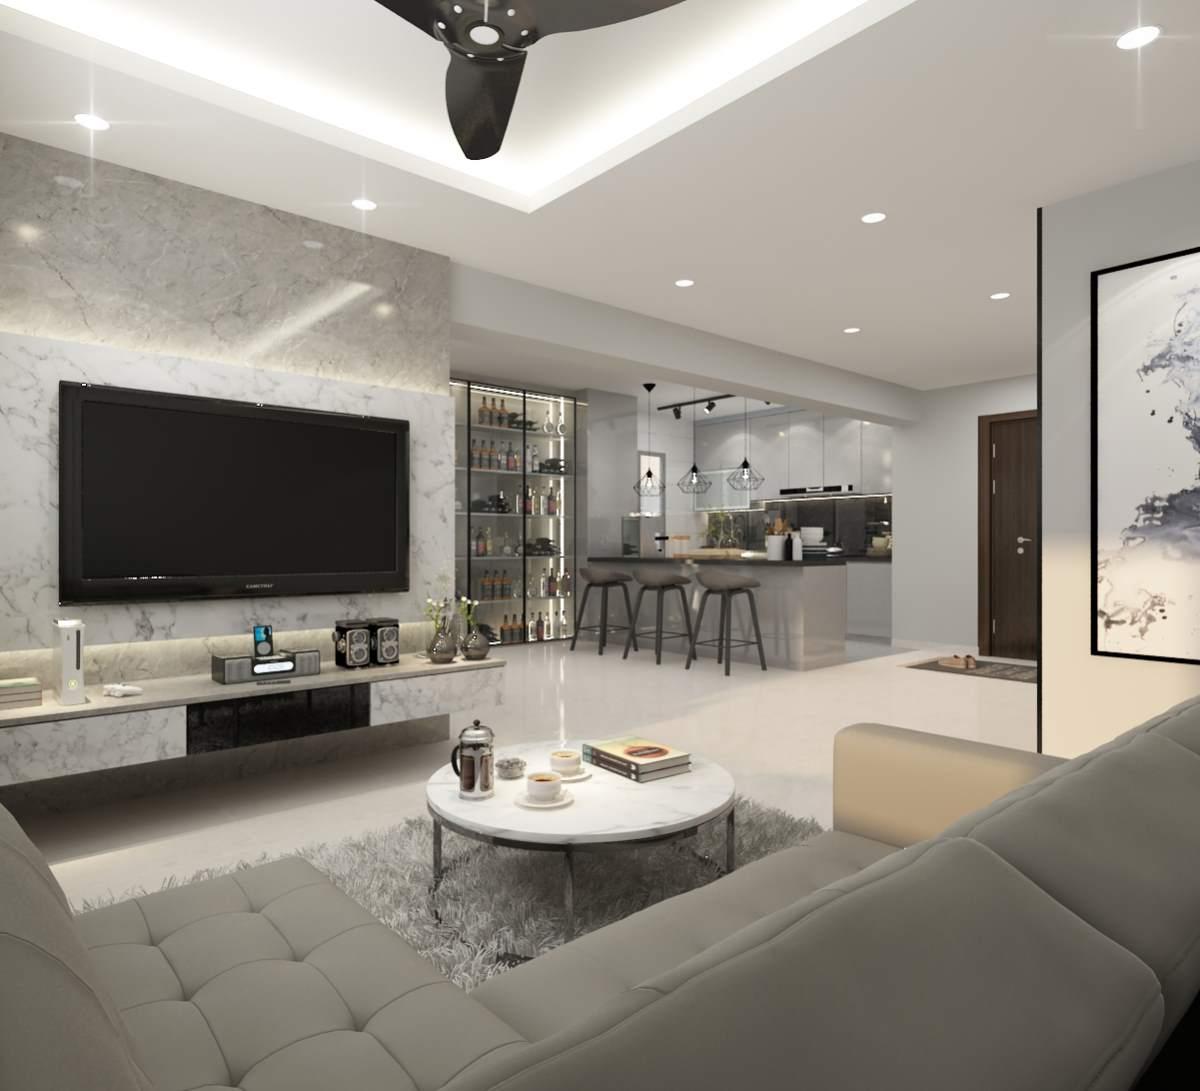 Fusion Concept Interior Design